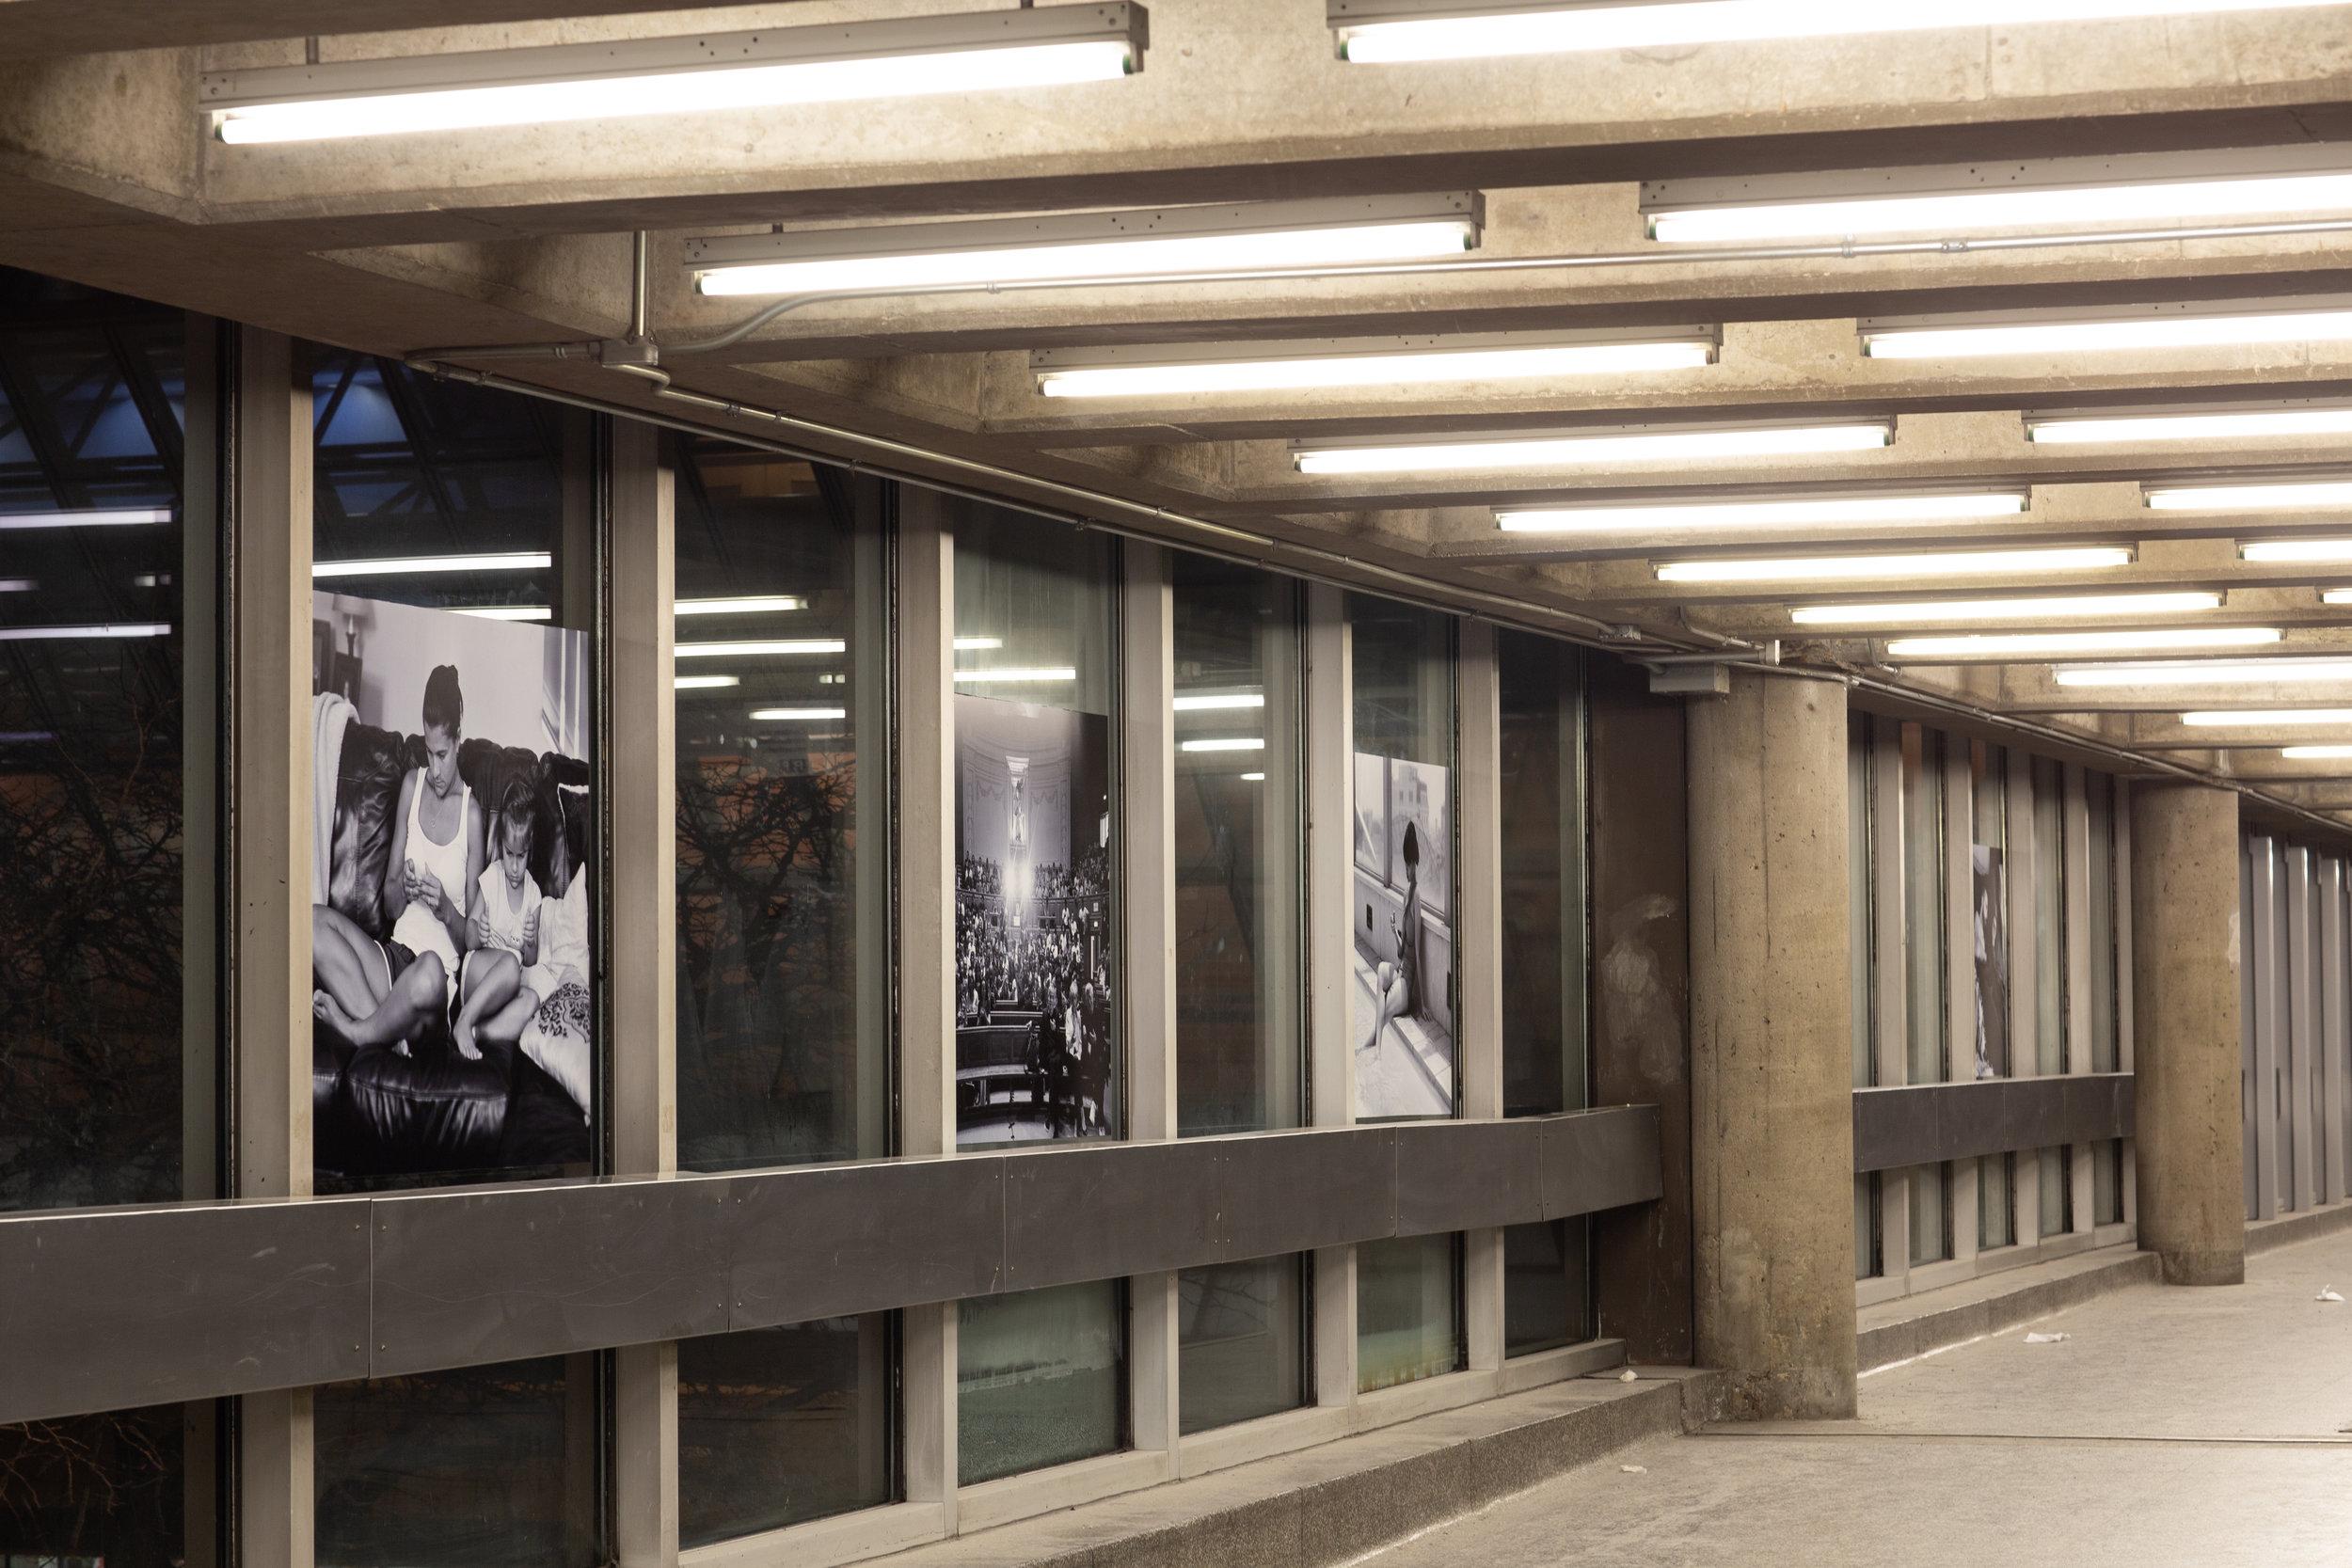 101-Nuit-Blanche-2019-Eric-Pickersgill-photo-Mike-Patten.jpg